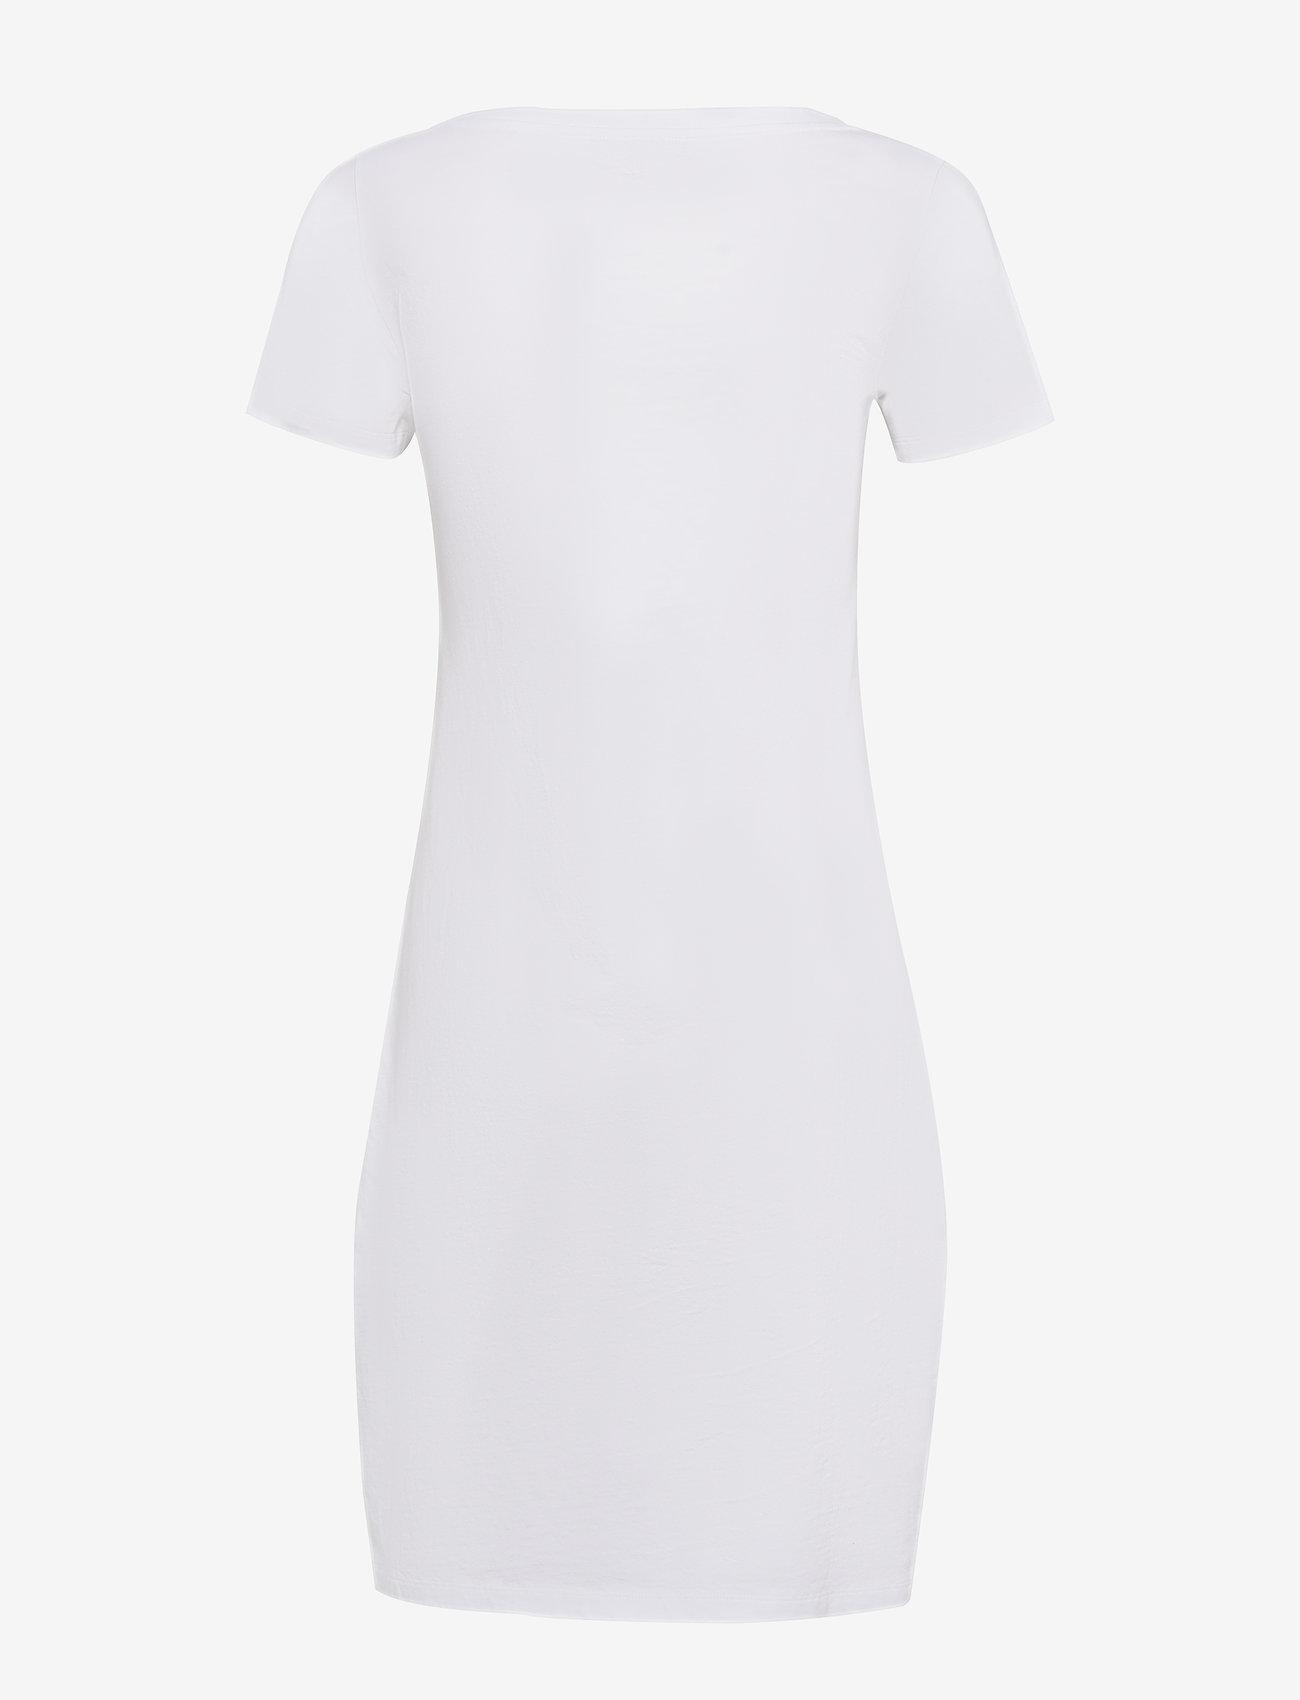 T-shirt (White) - Ilse Jacobsen 7AjjoS